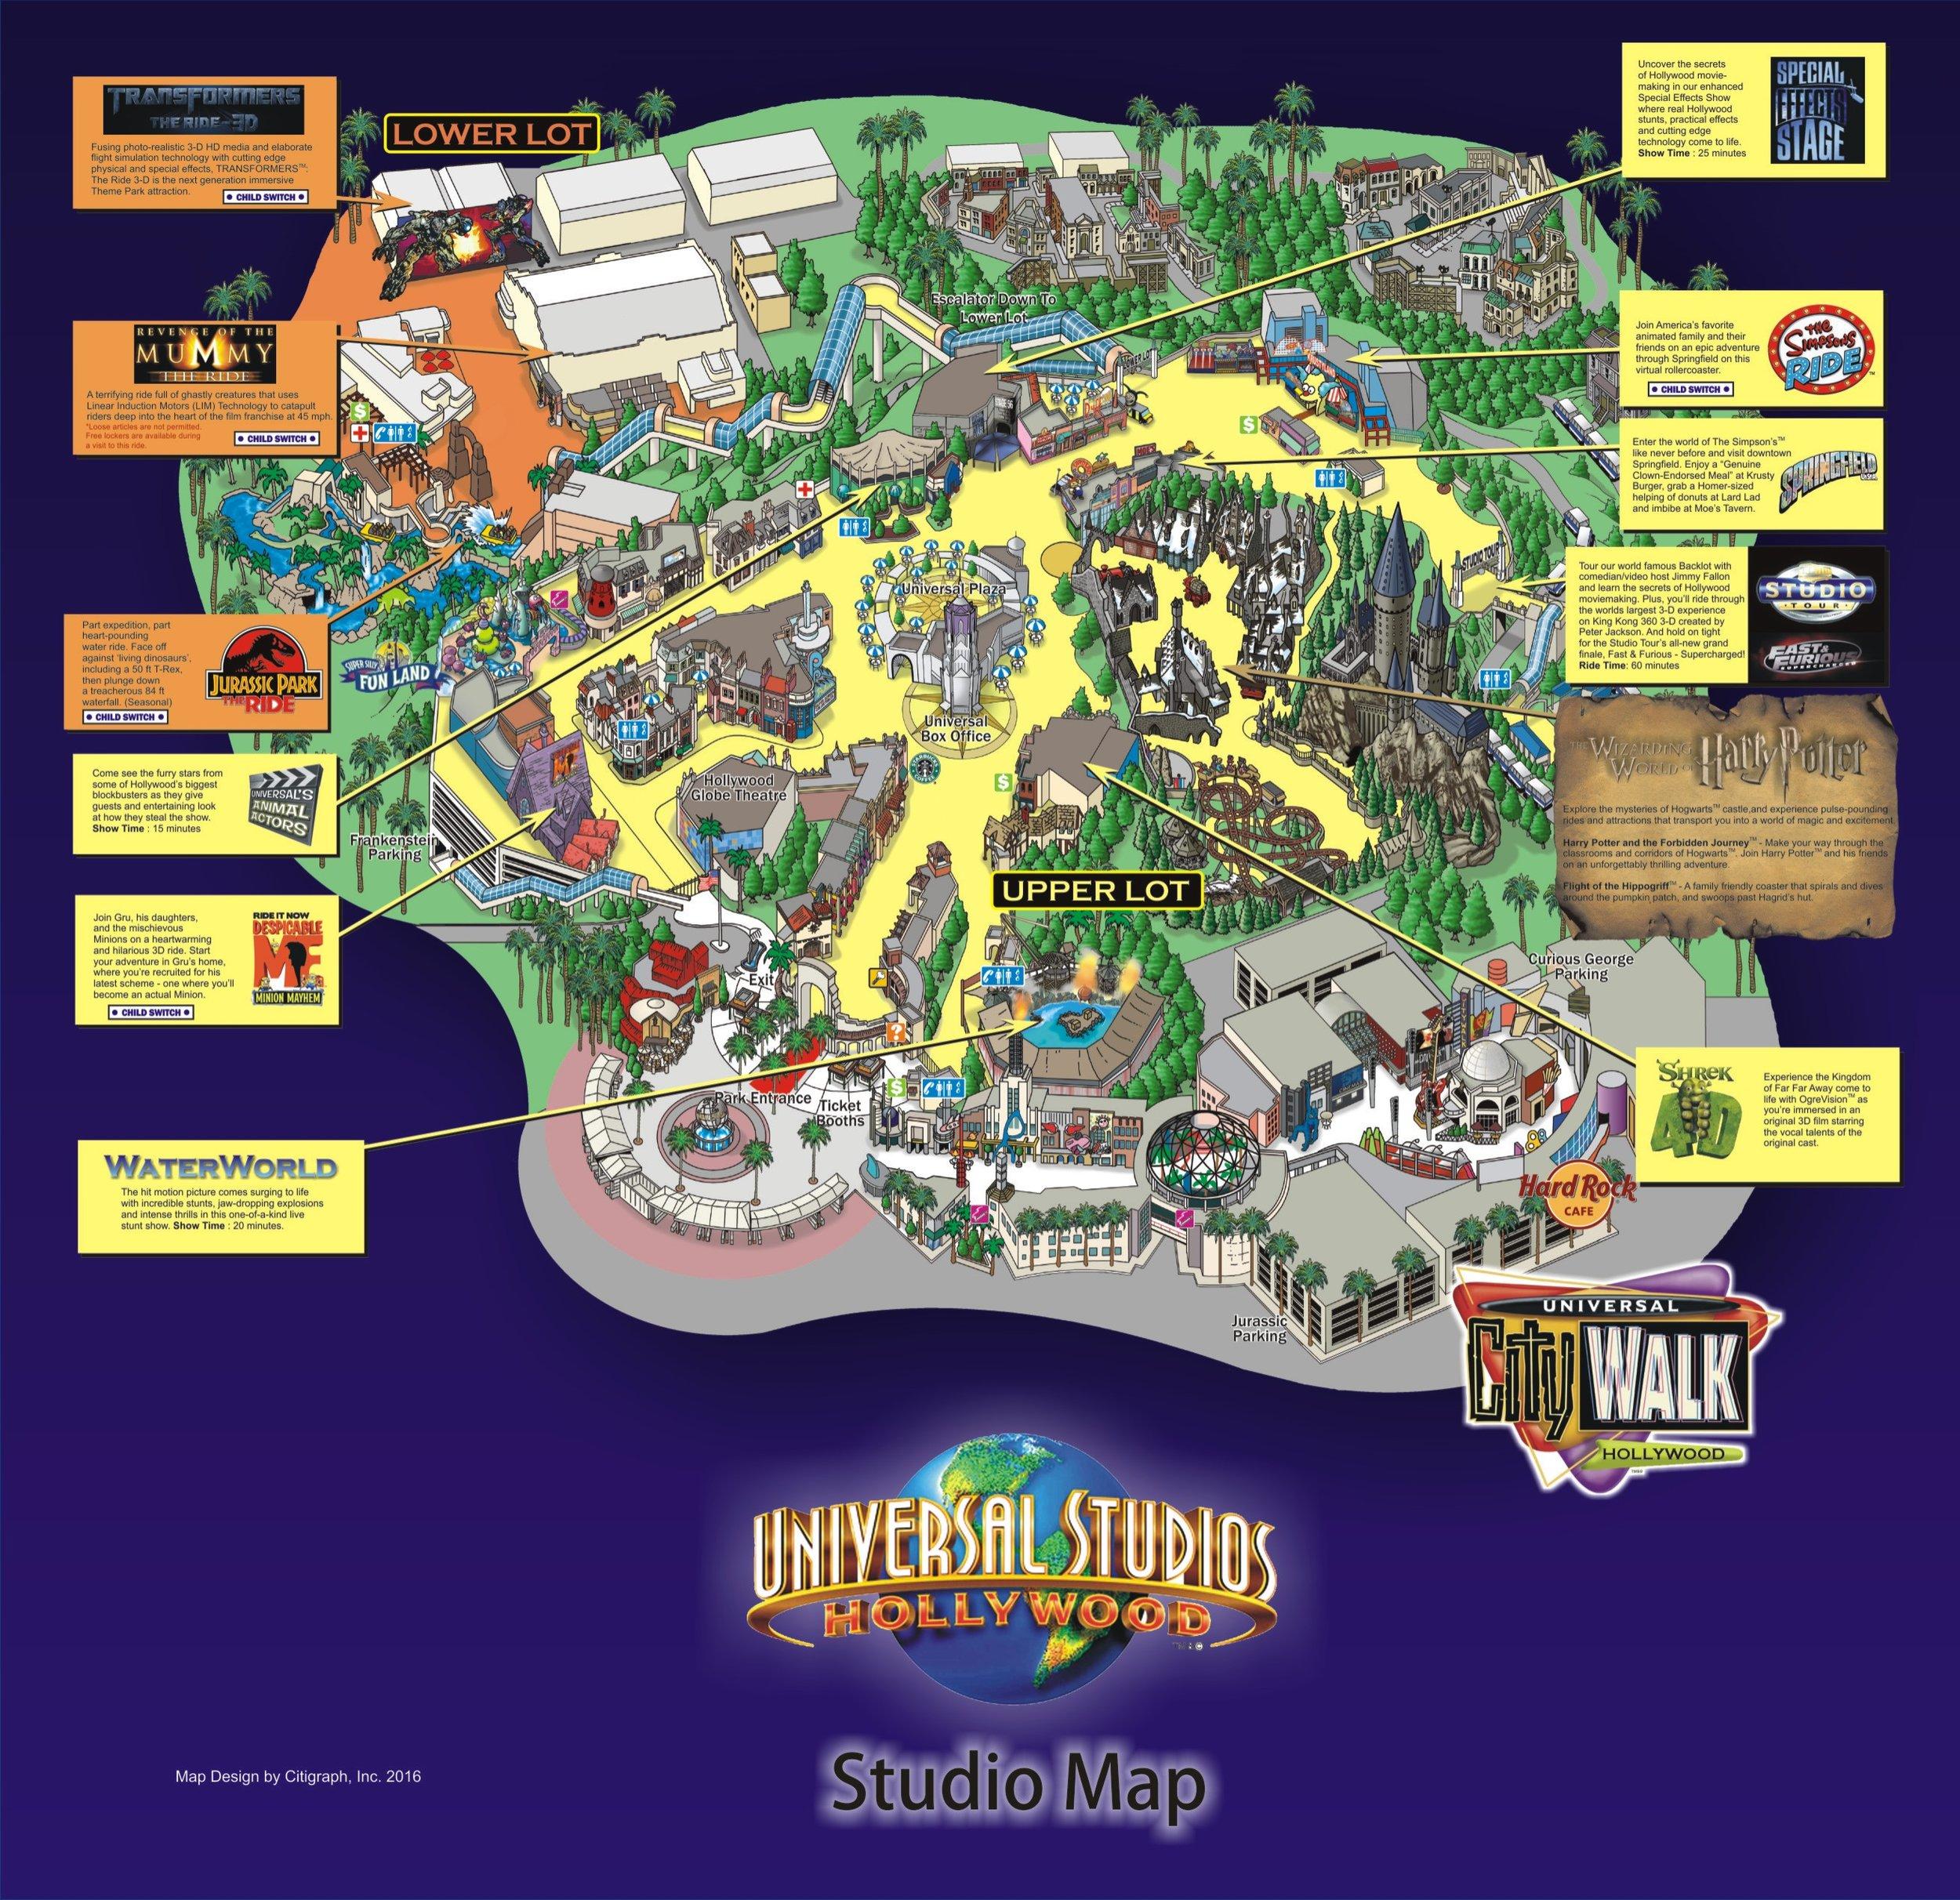 Universal Studios Hollywood.jpg